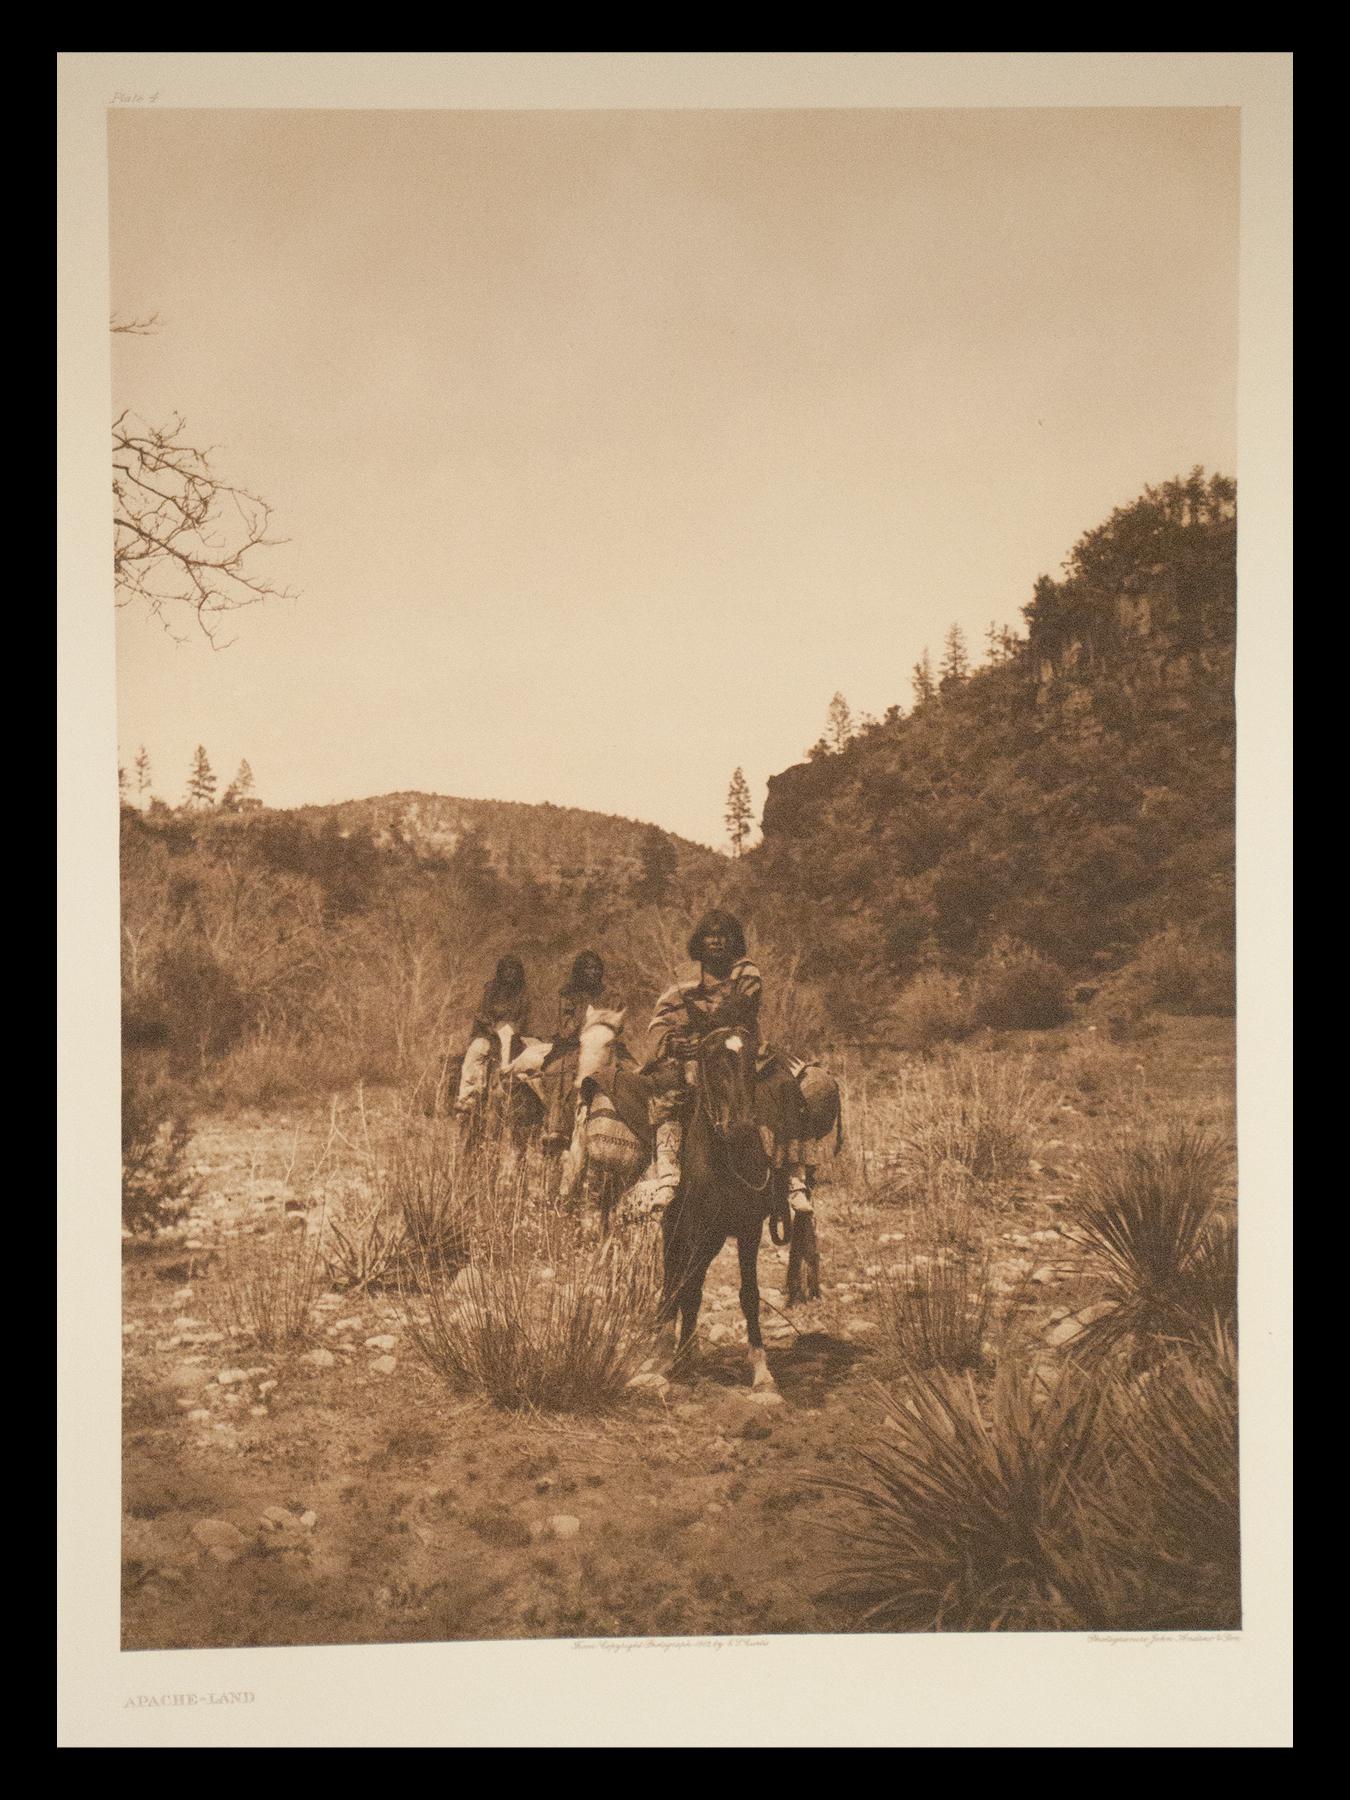 Apache - Land final.jpg